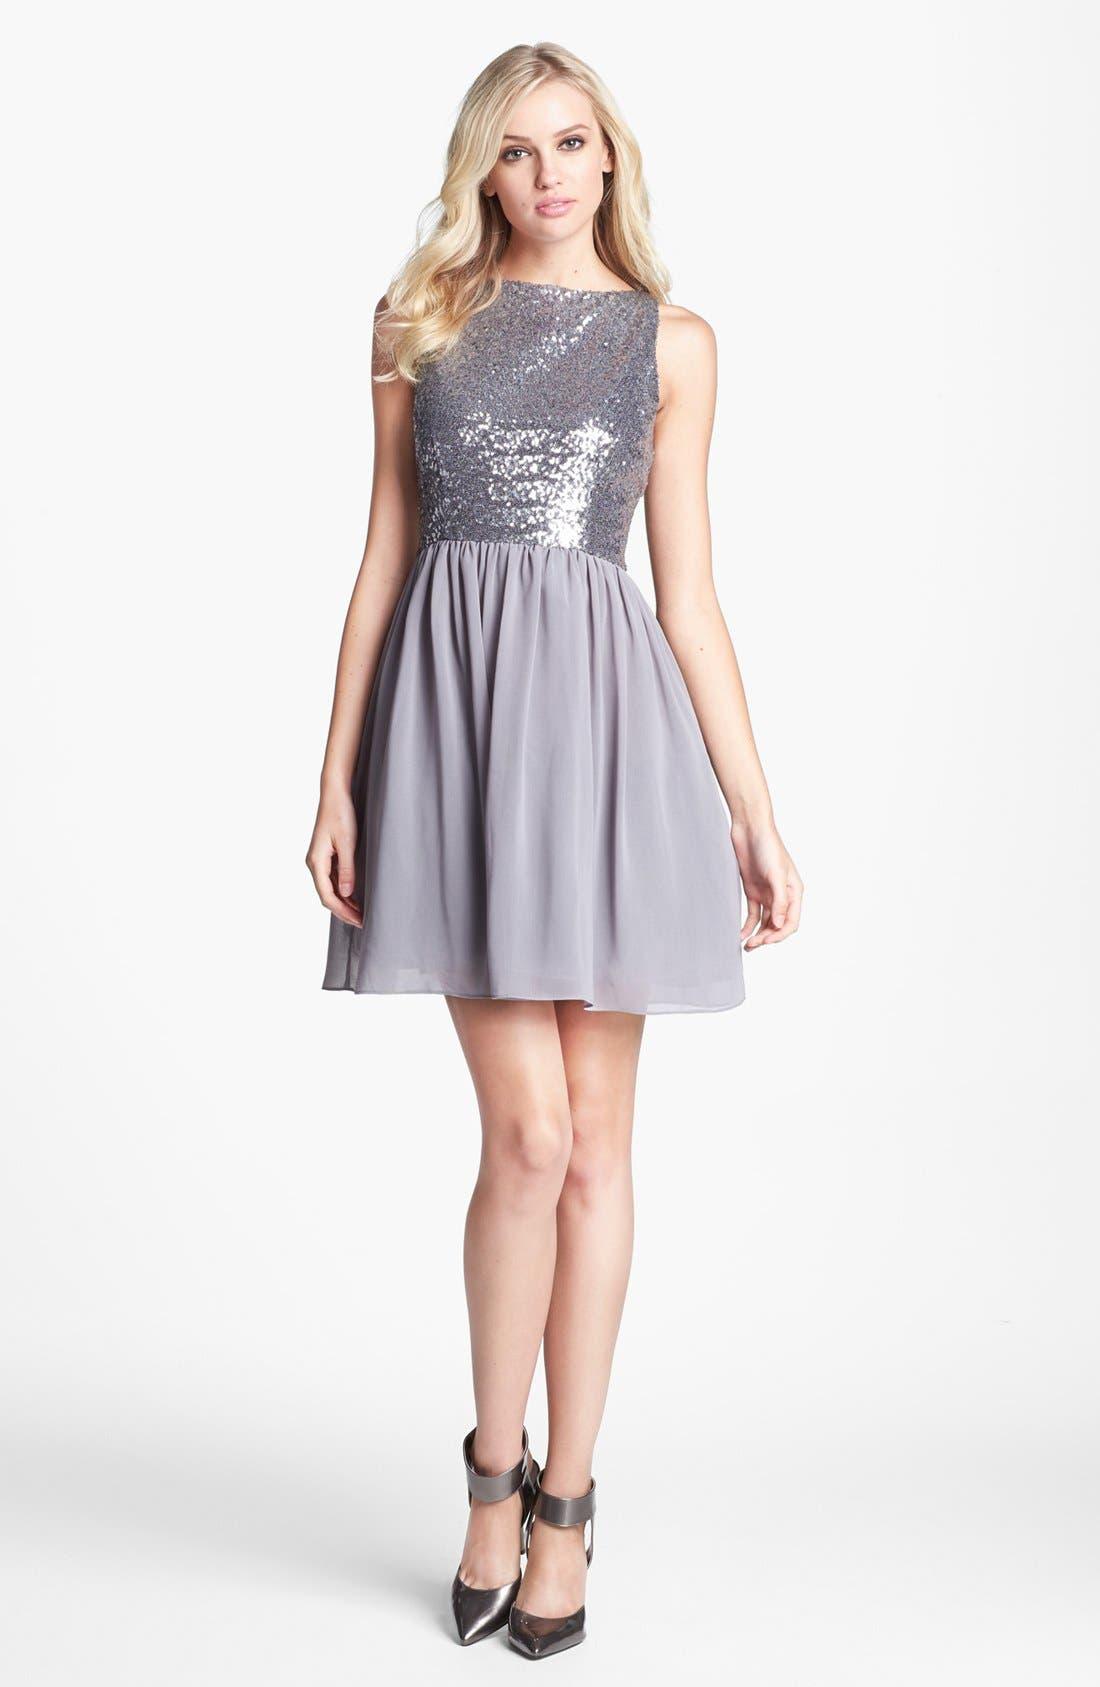 Alternate Image 1 Selected - BB Dakota Embellished Fit & Flare Dress